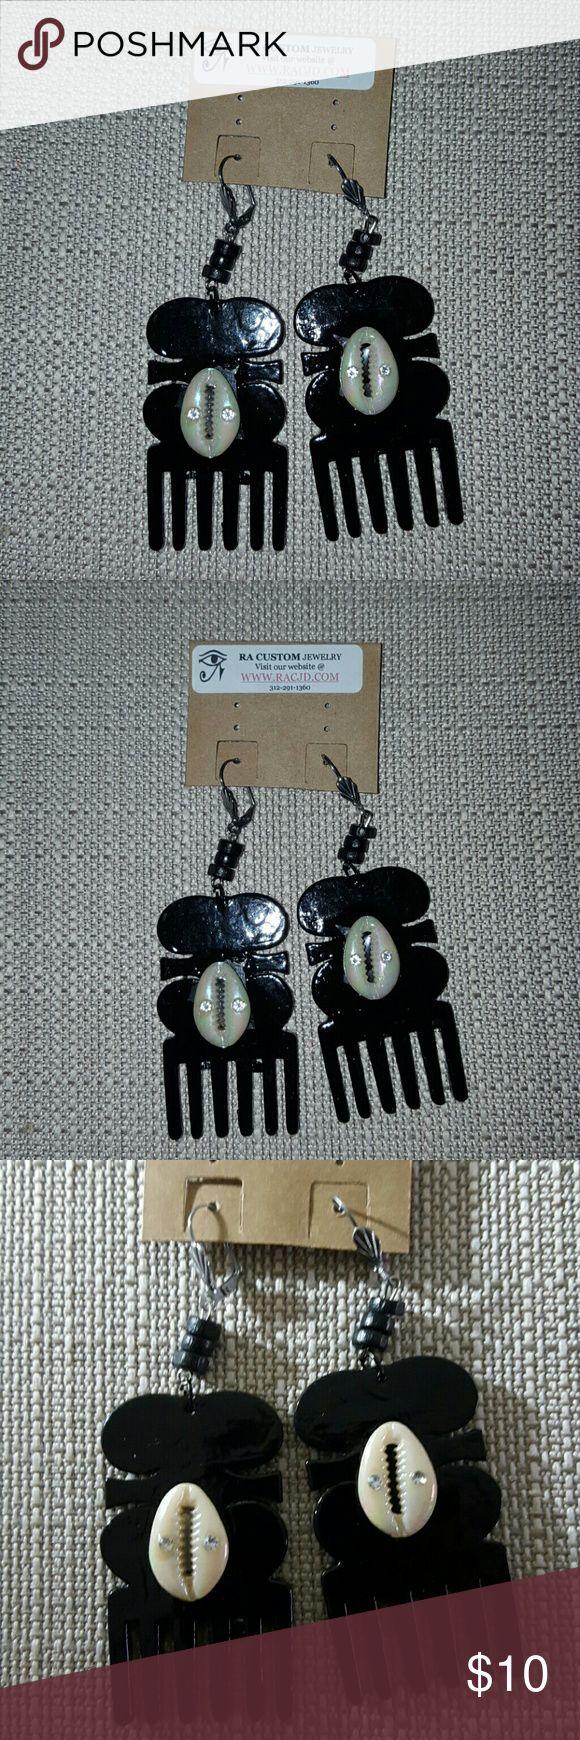 Afro pick comb handpainted Black Earrings Afro pick comb handpainted Black black Earrings with Silver Stainlees steel lever backs ear wires hypoallergenic. Jewelry Earrings